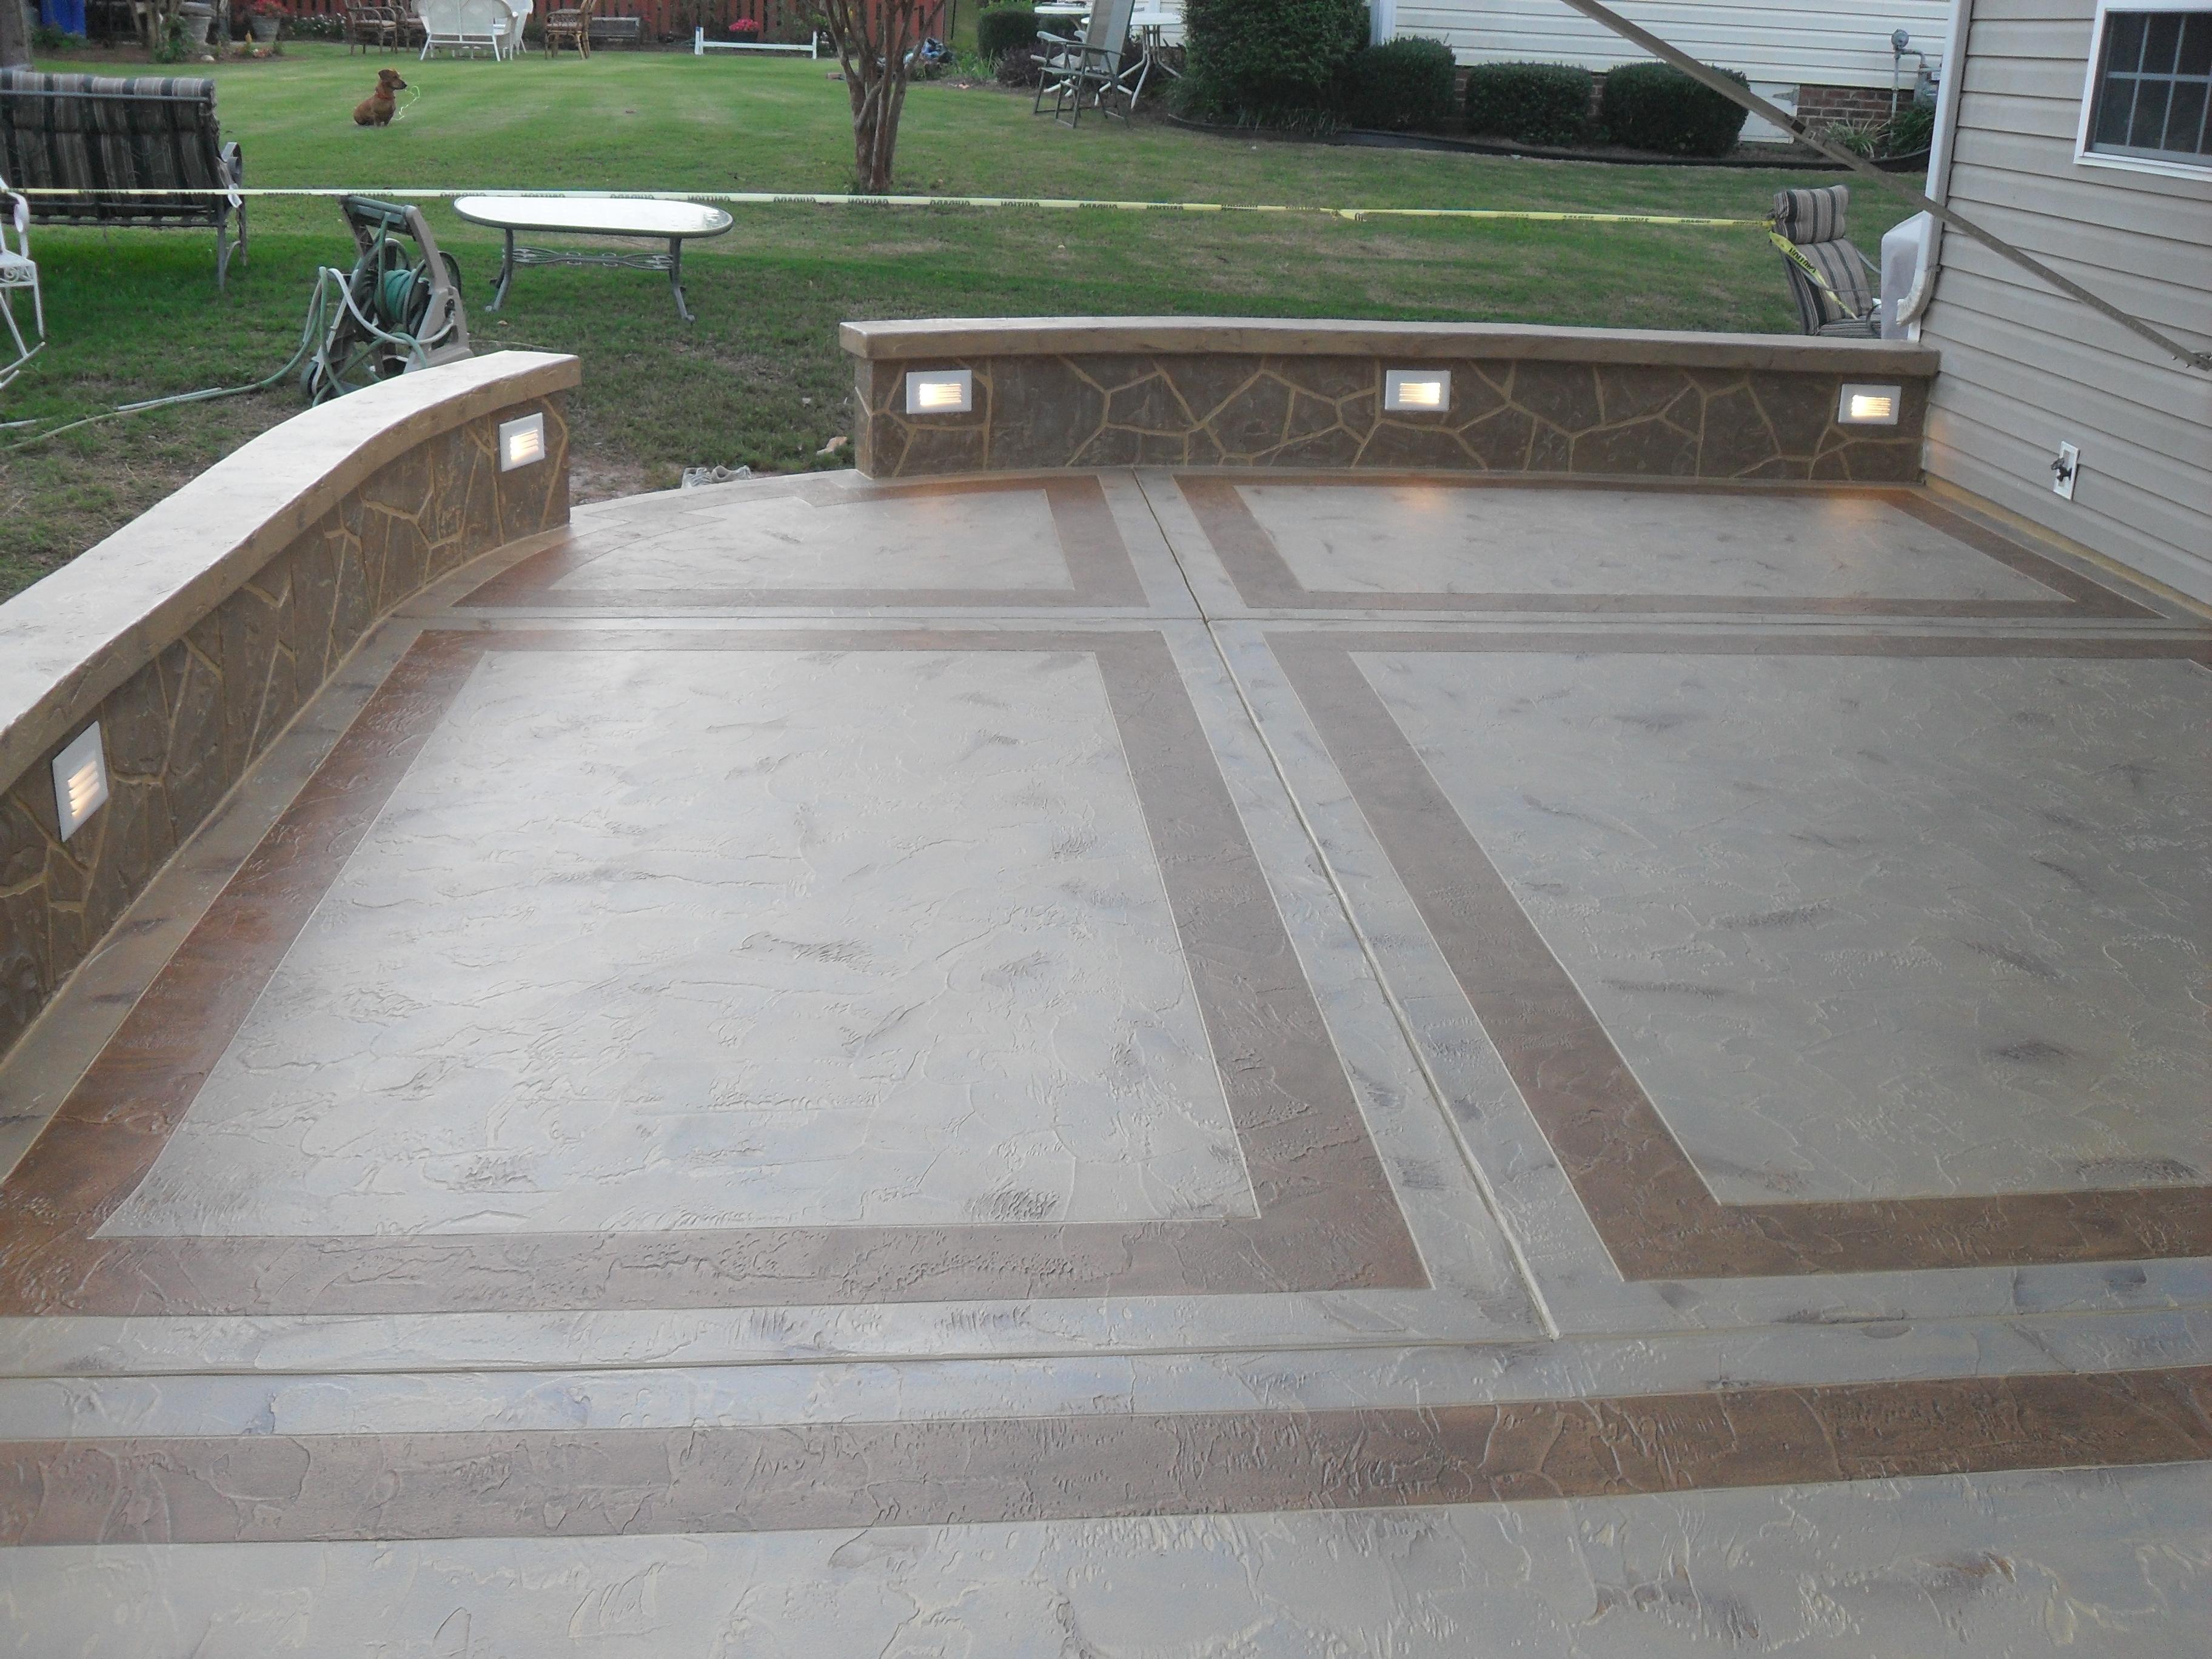 Concrete Patio Design Contractor, Ashburn Northern VA & DC ... on Cement Patio Ideas id=27291